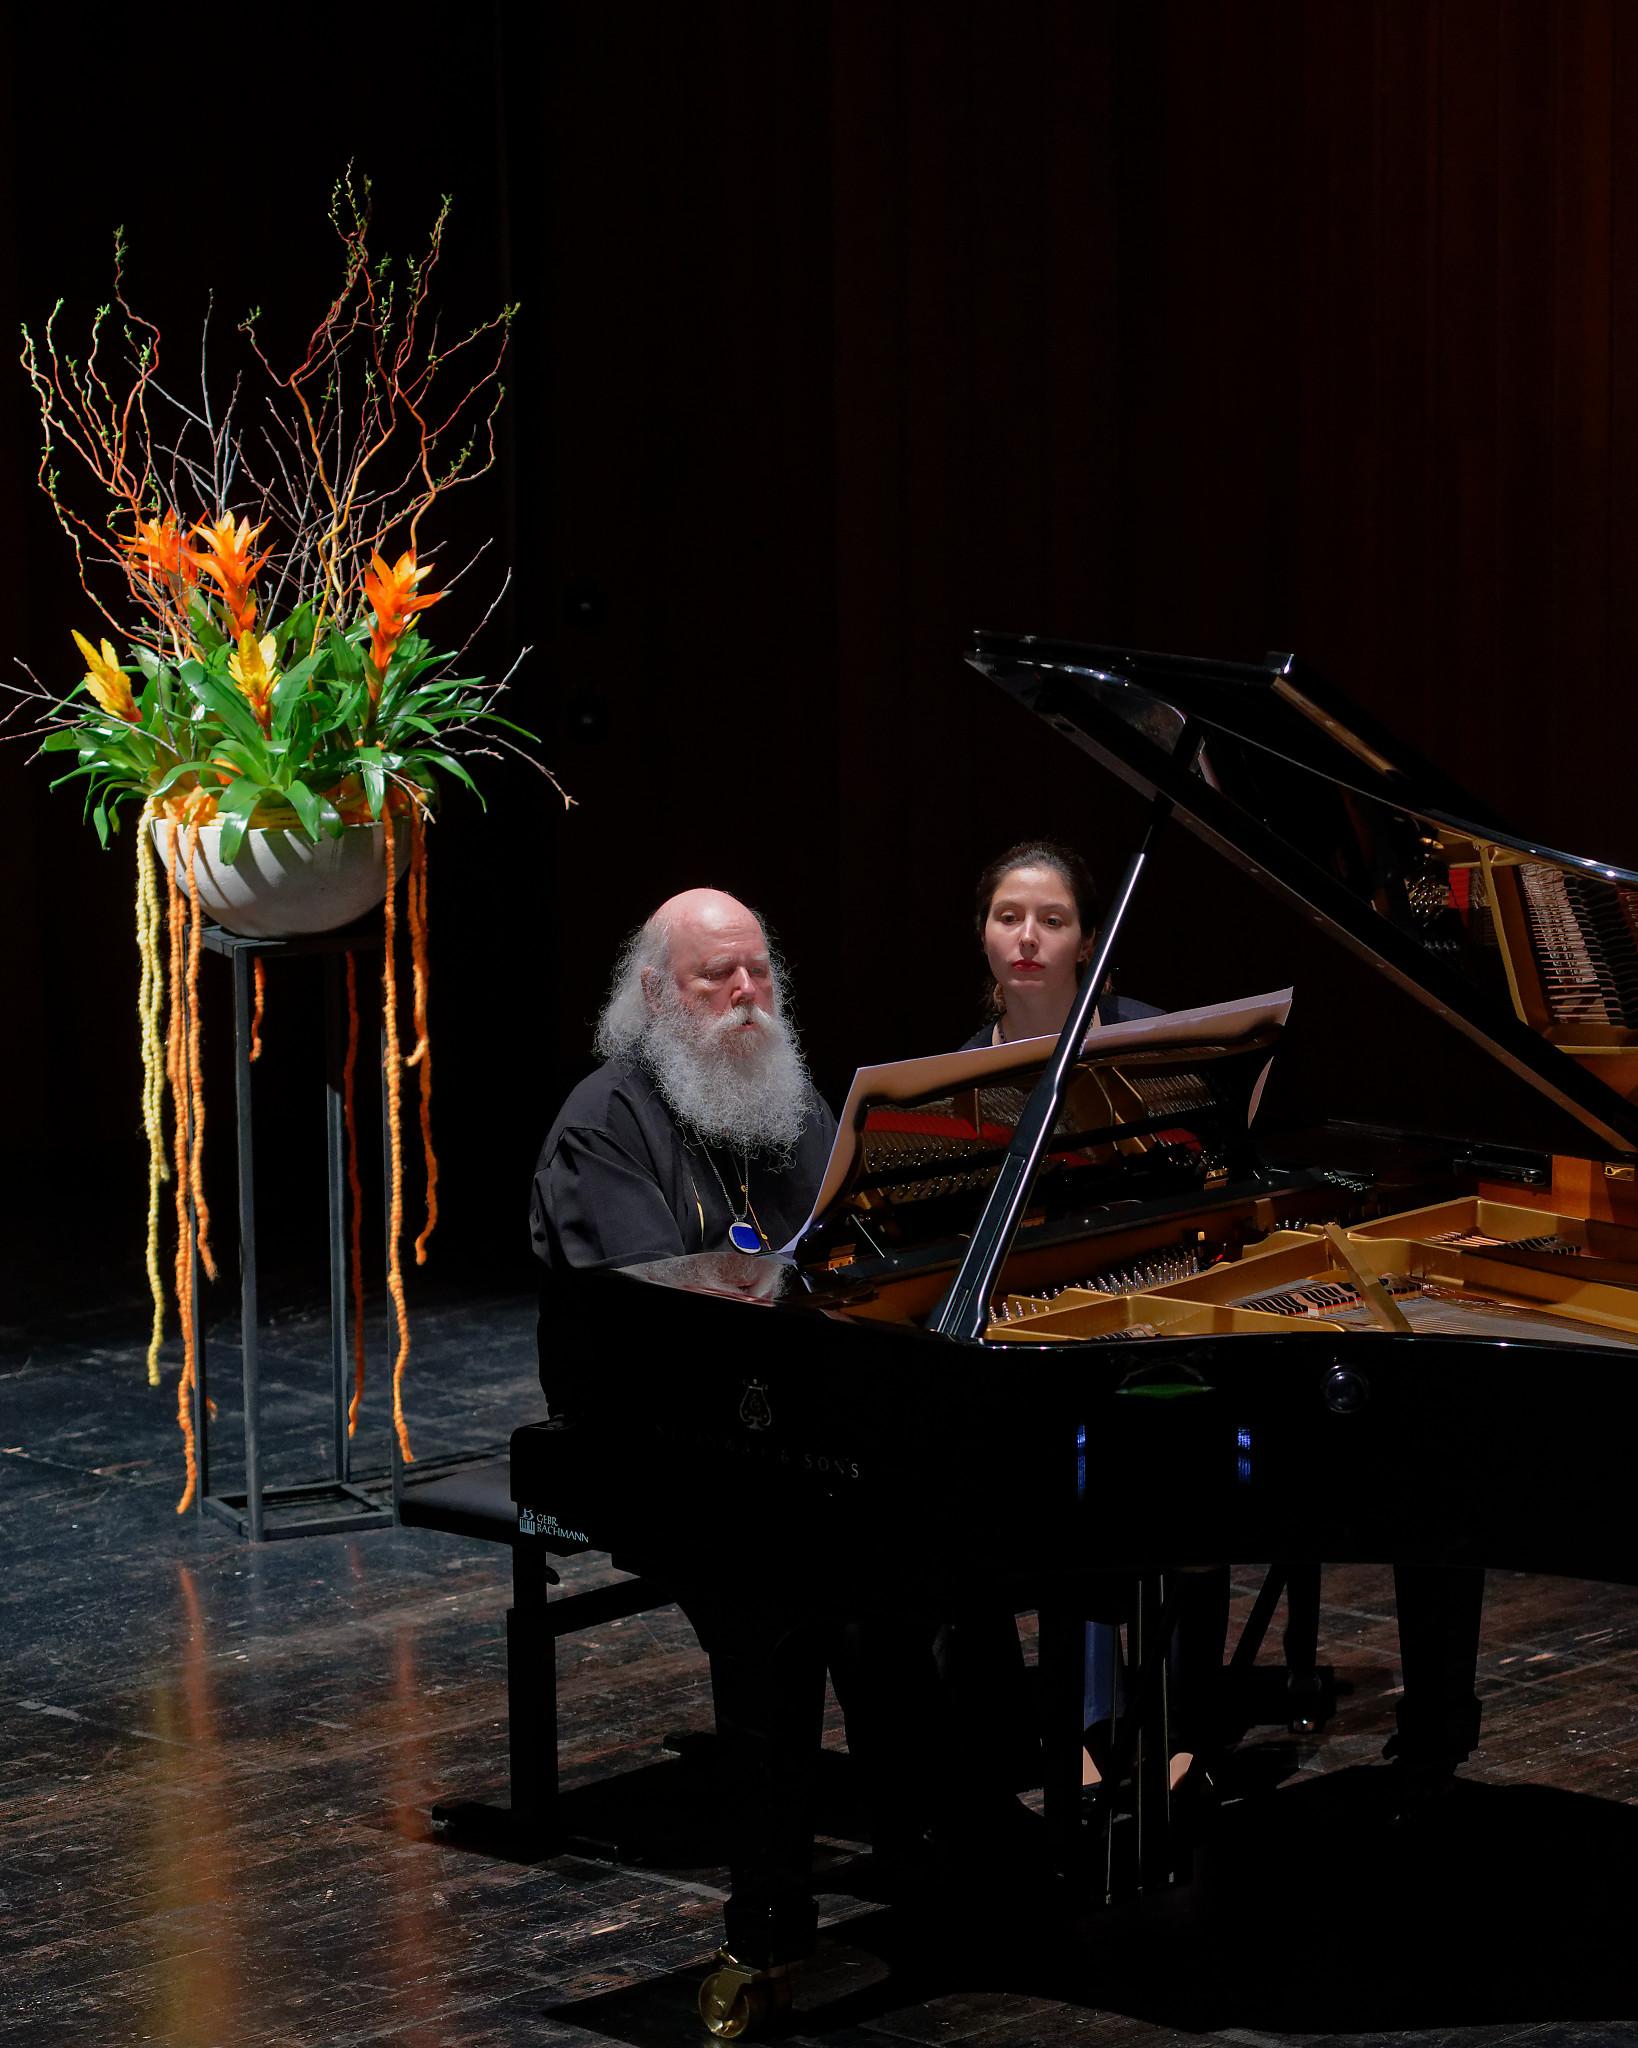 Werner Bärtschi (& Alina Bercu) @ Klavierissimo Festival, Wetzikon ZH, 2020-01-29 (© Rolf Kyburz)